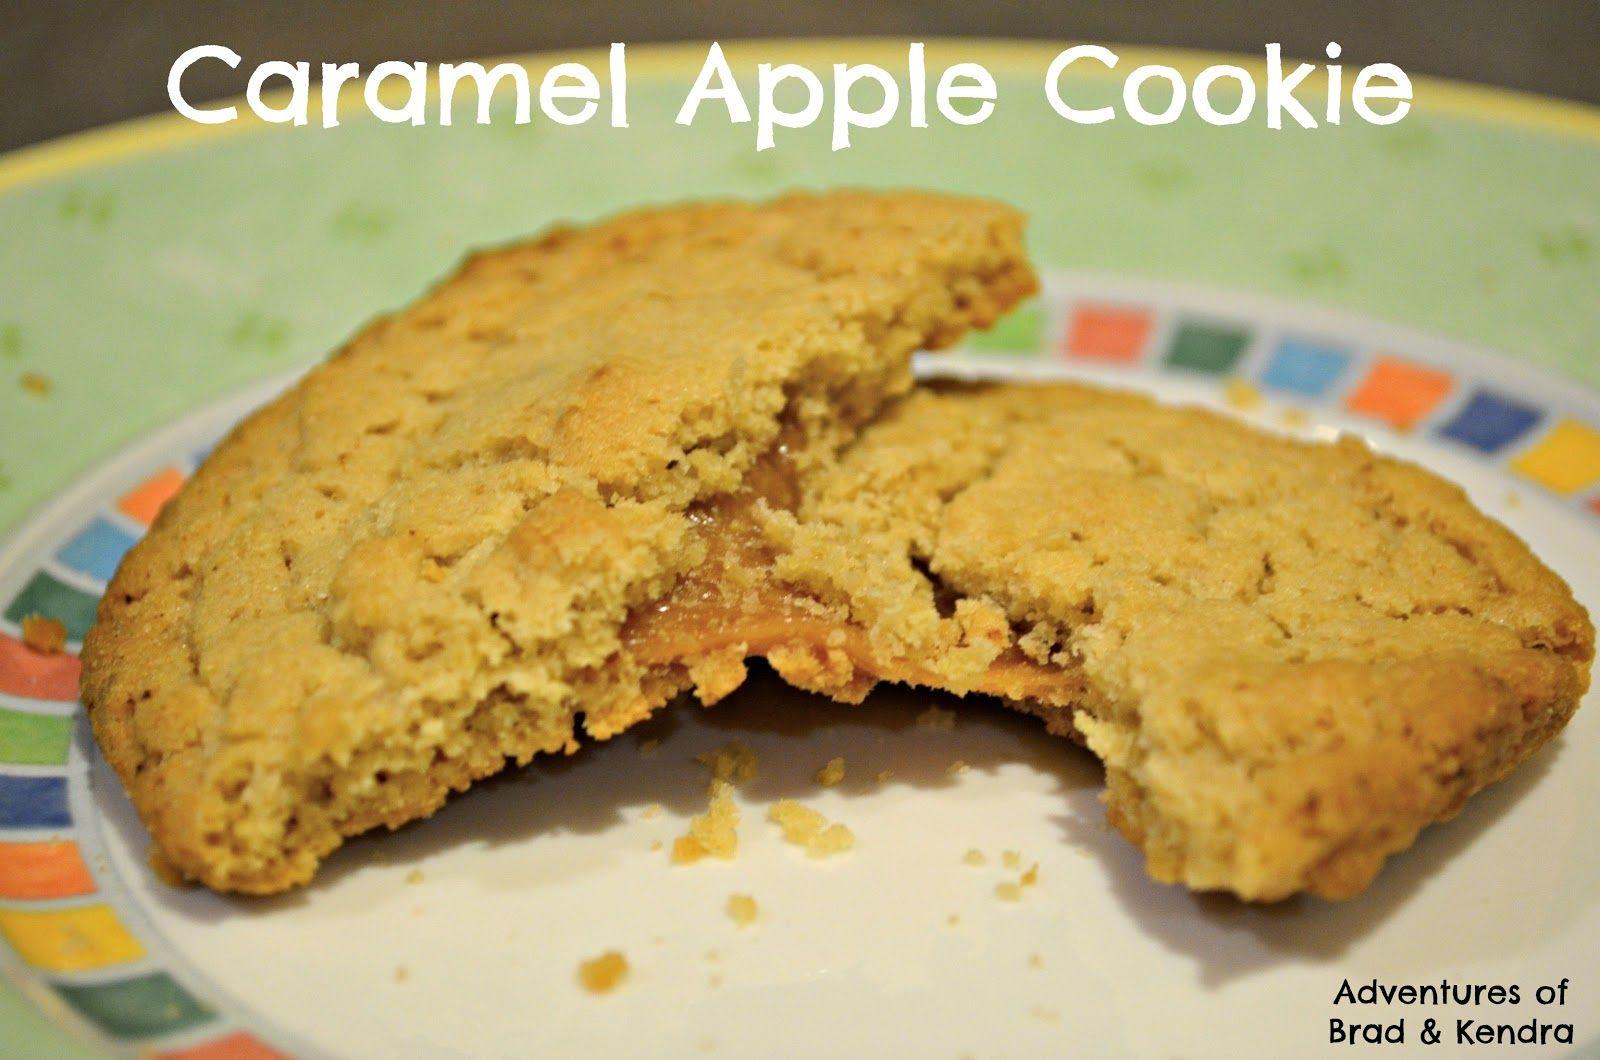 Adventures of Brad & Kendra: Caramel Apple Cookies